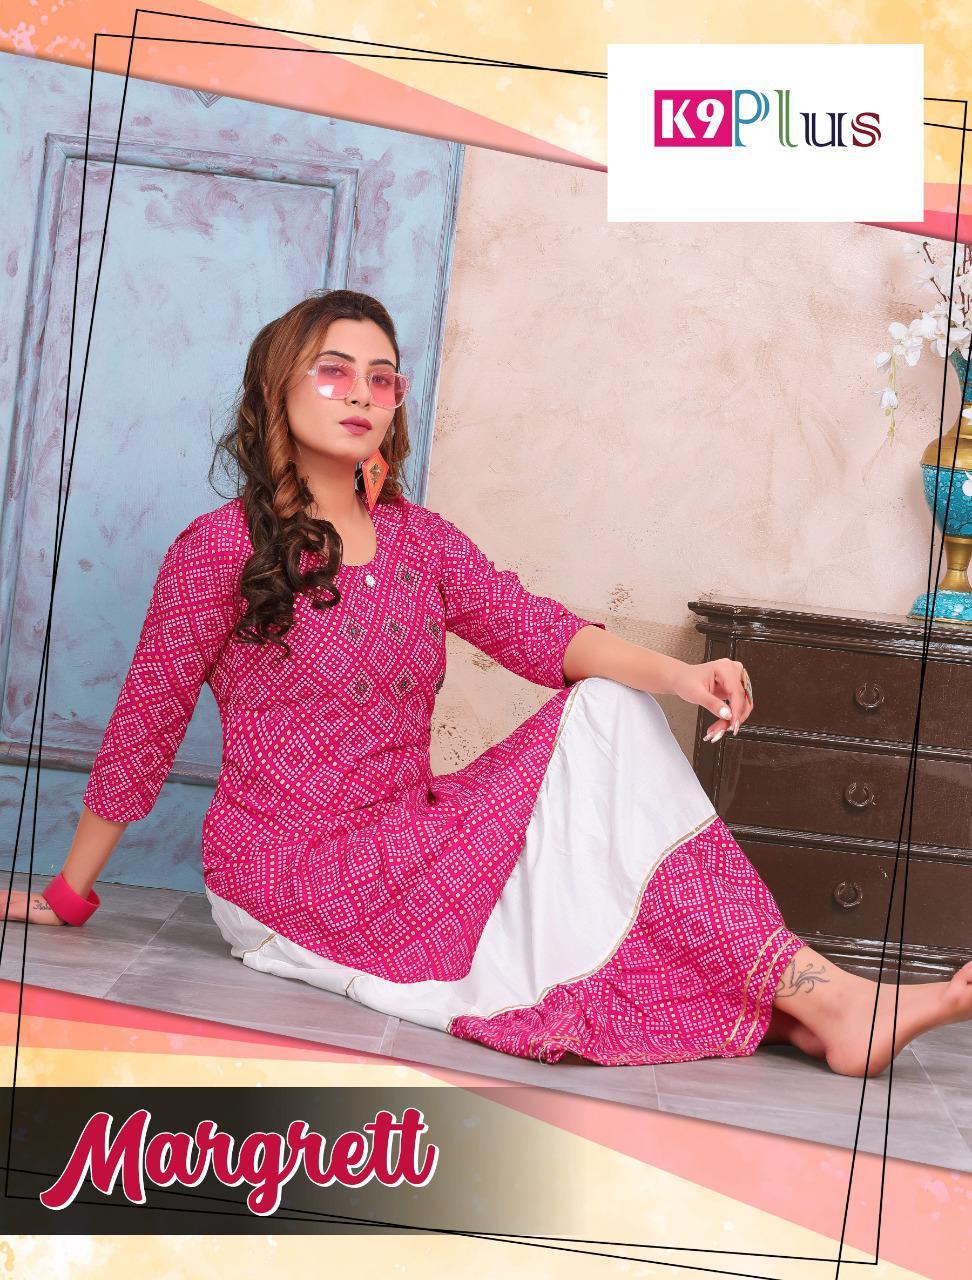 K9 Plus Margrett Rayon Bandhani Print Sharara Skirt With Top Pattern